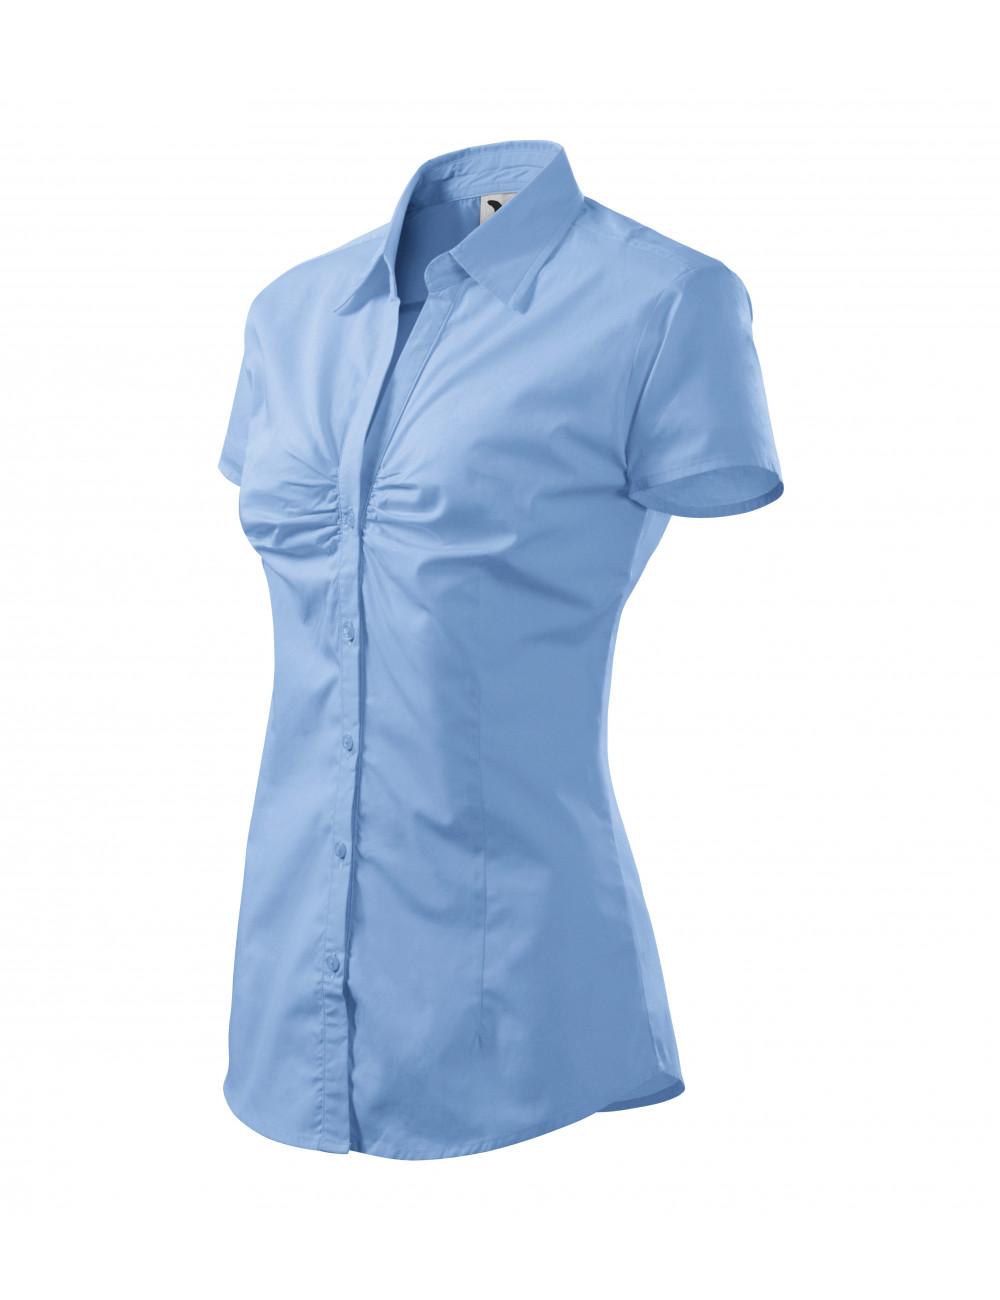 Adler MALFINI Koszula damska Chic 214 błękitny